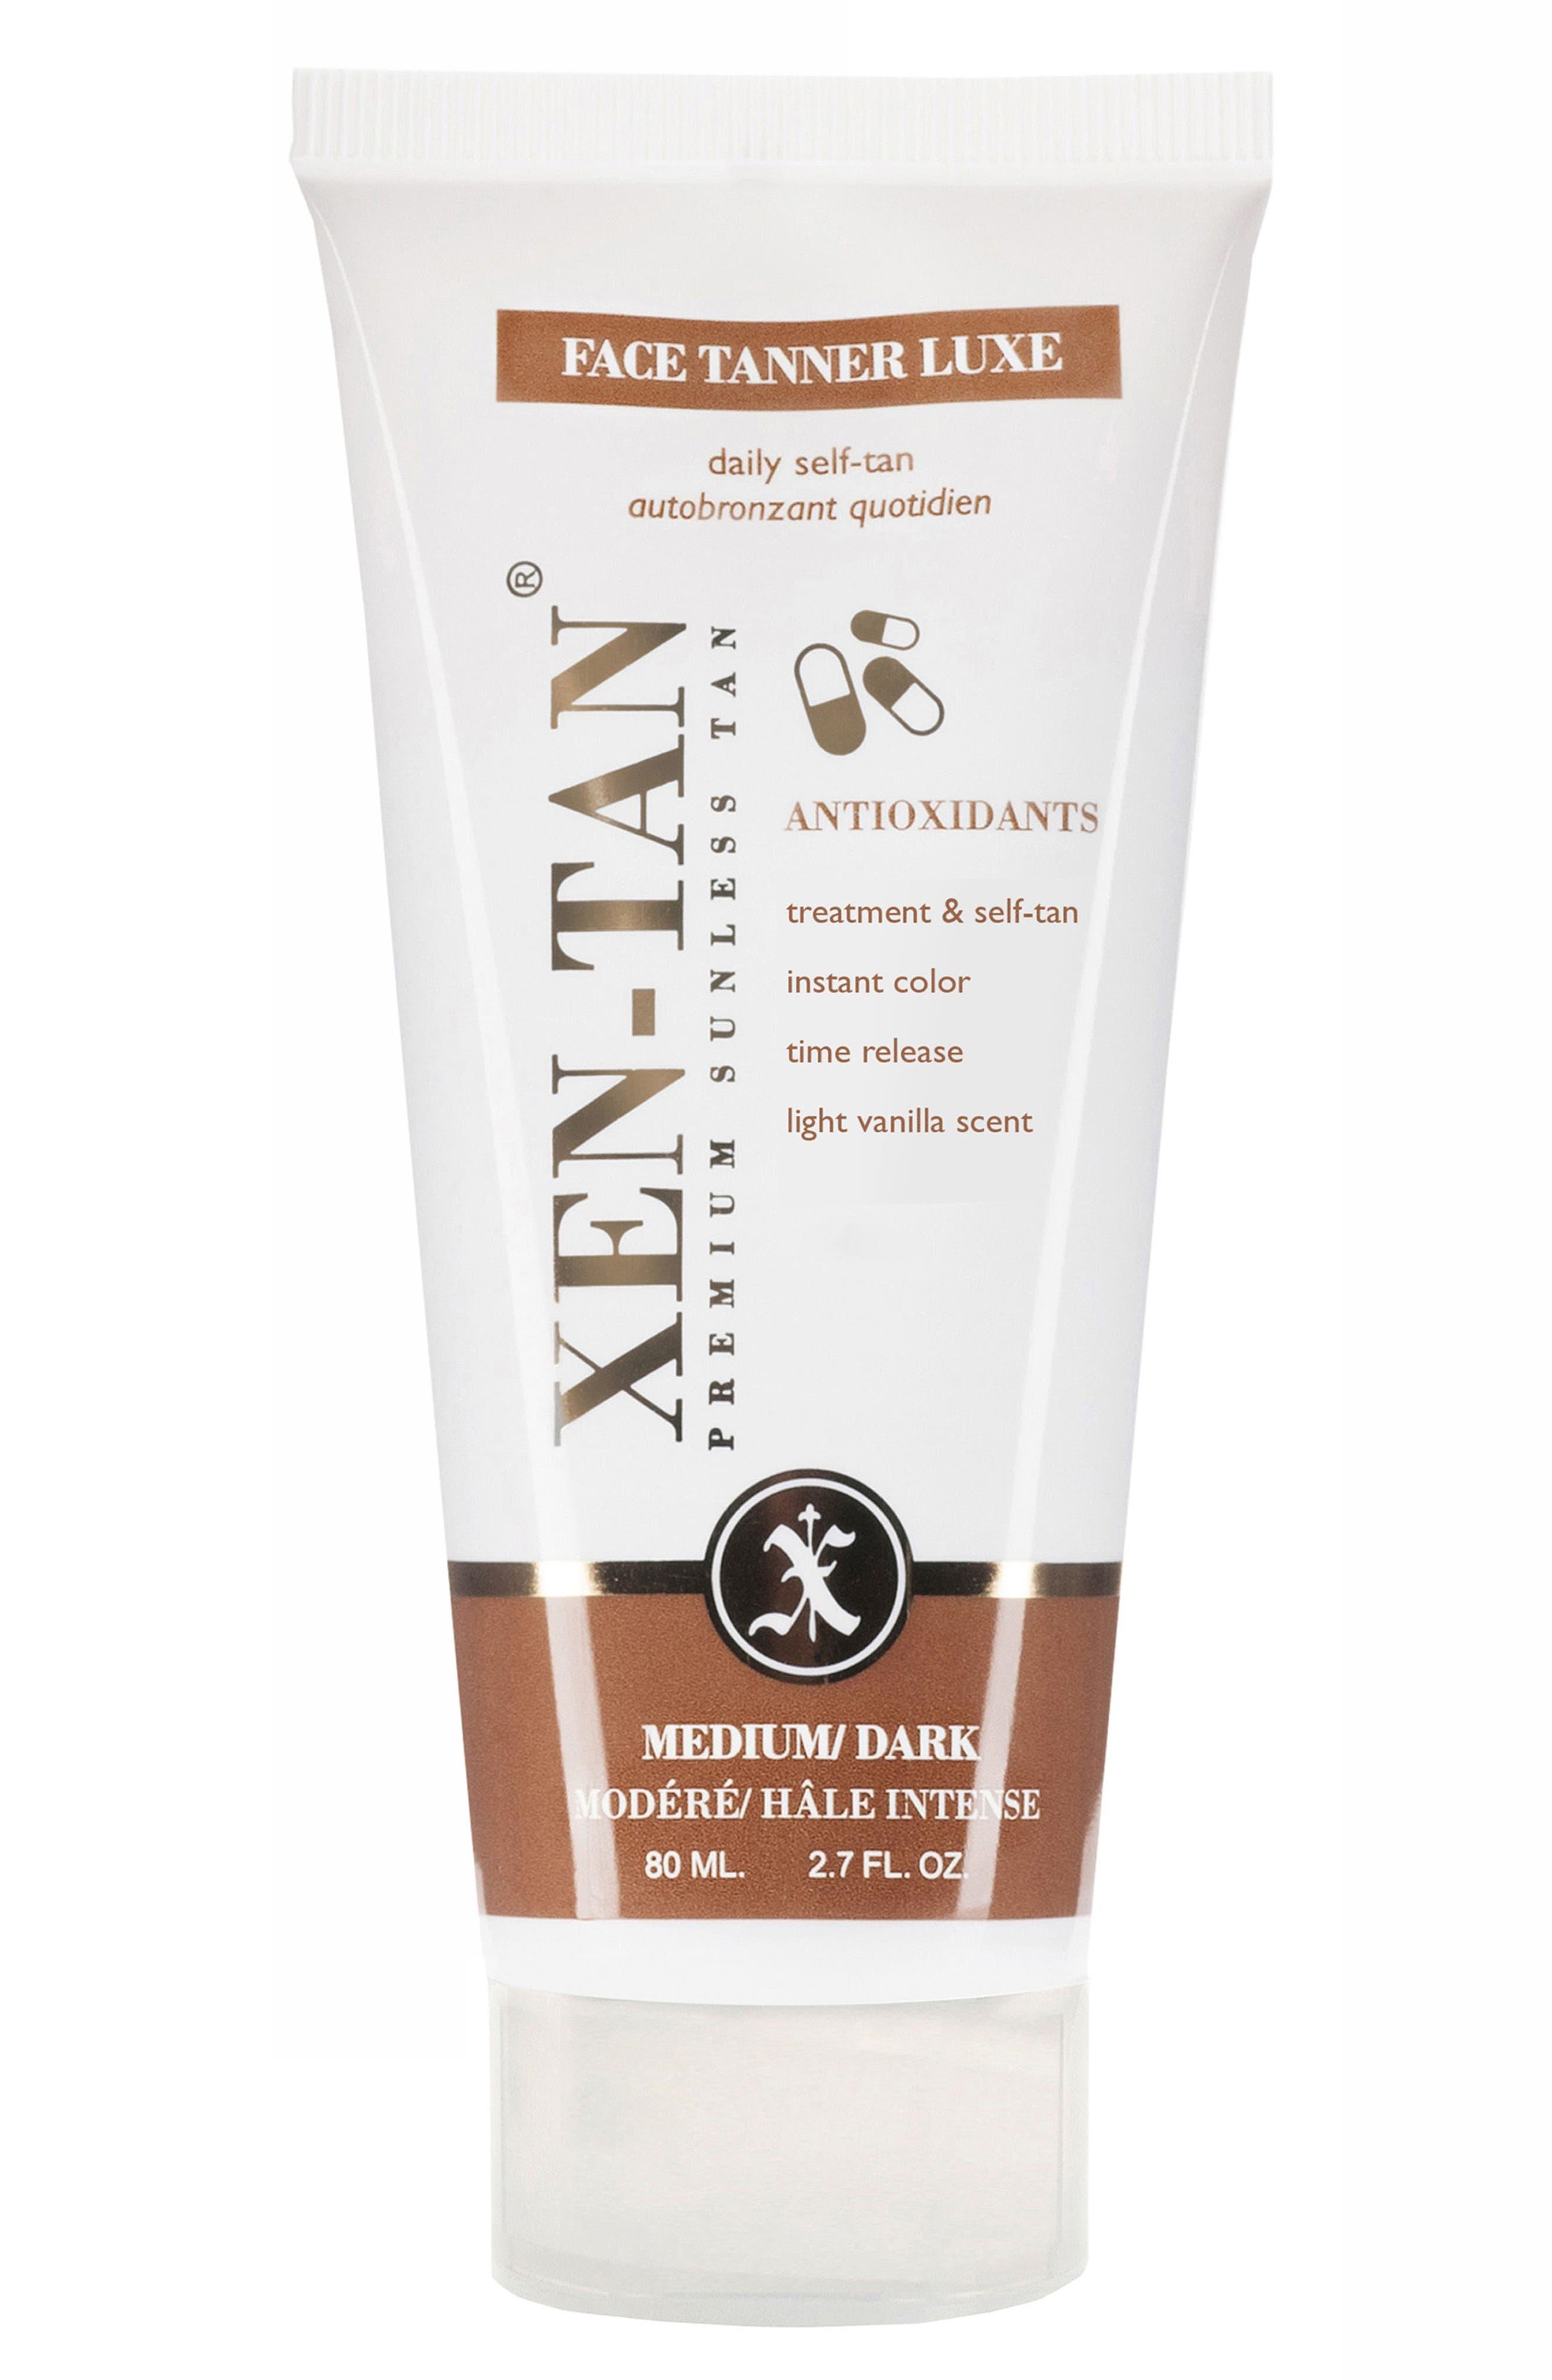 Xen-Tan® 'Face Tanner Luxe' Premium Sunless Tan